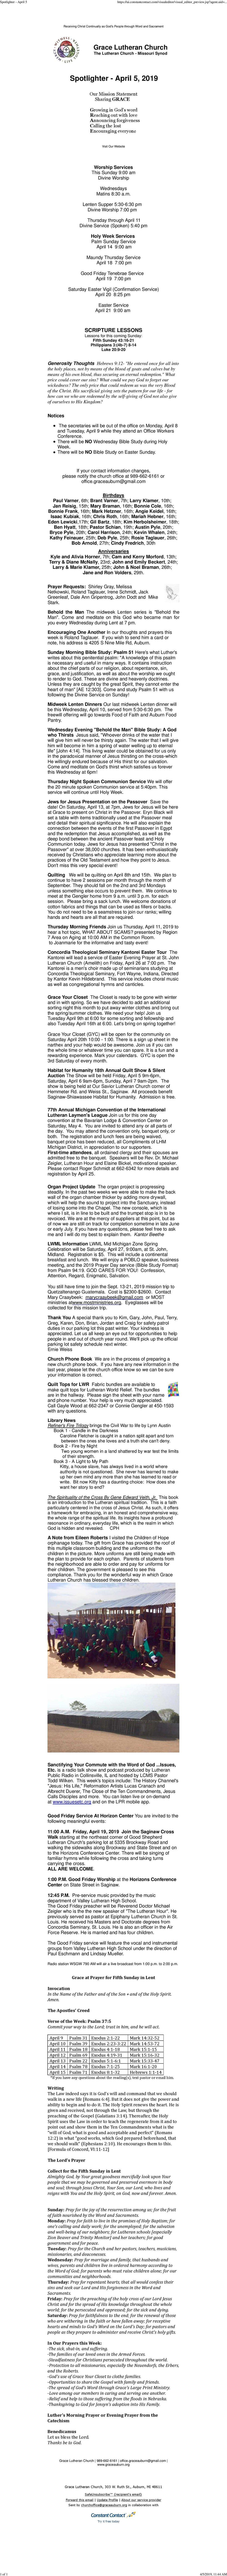 Spotlighter - April 5-page-001.jpg